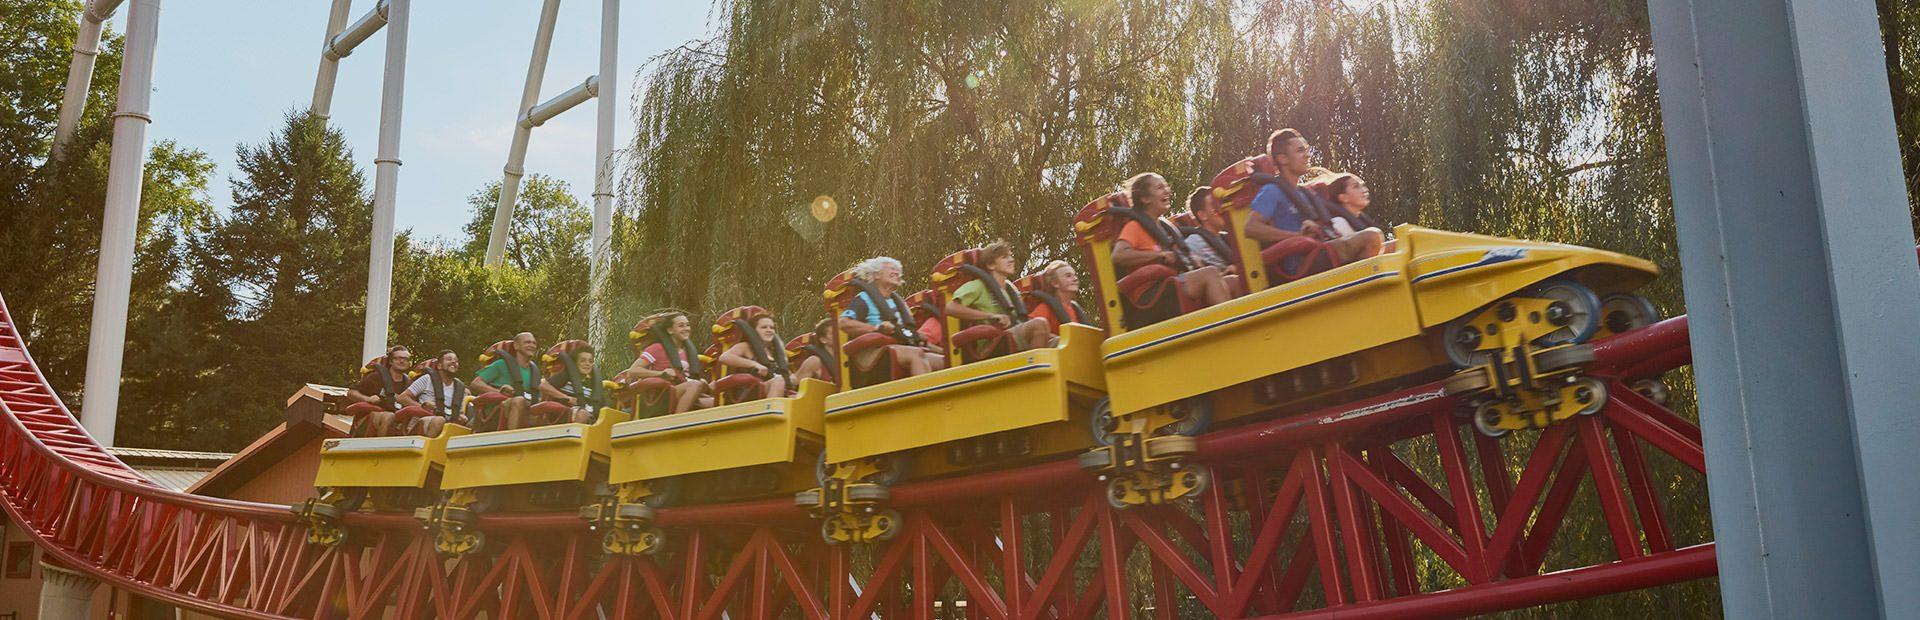 Hershey Rides Coasters StormRunner ride